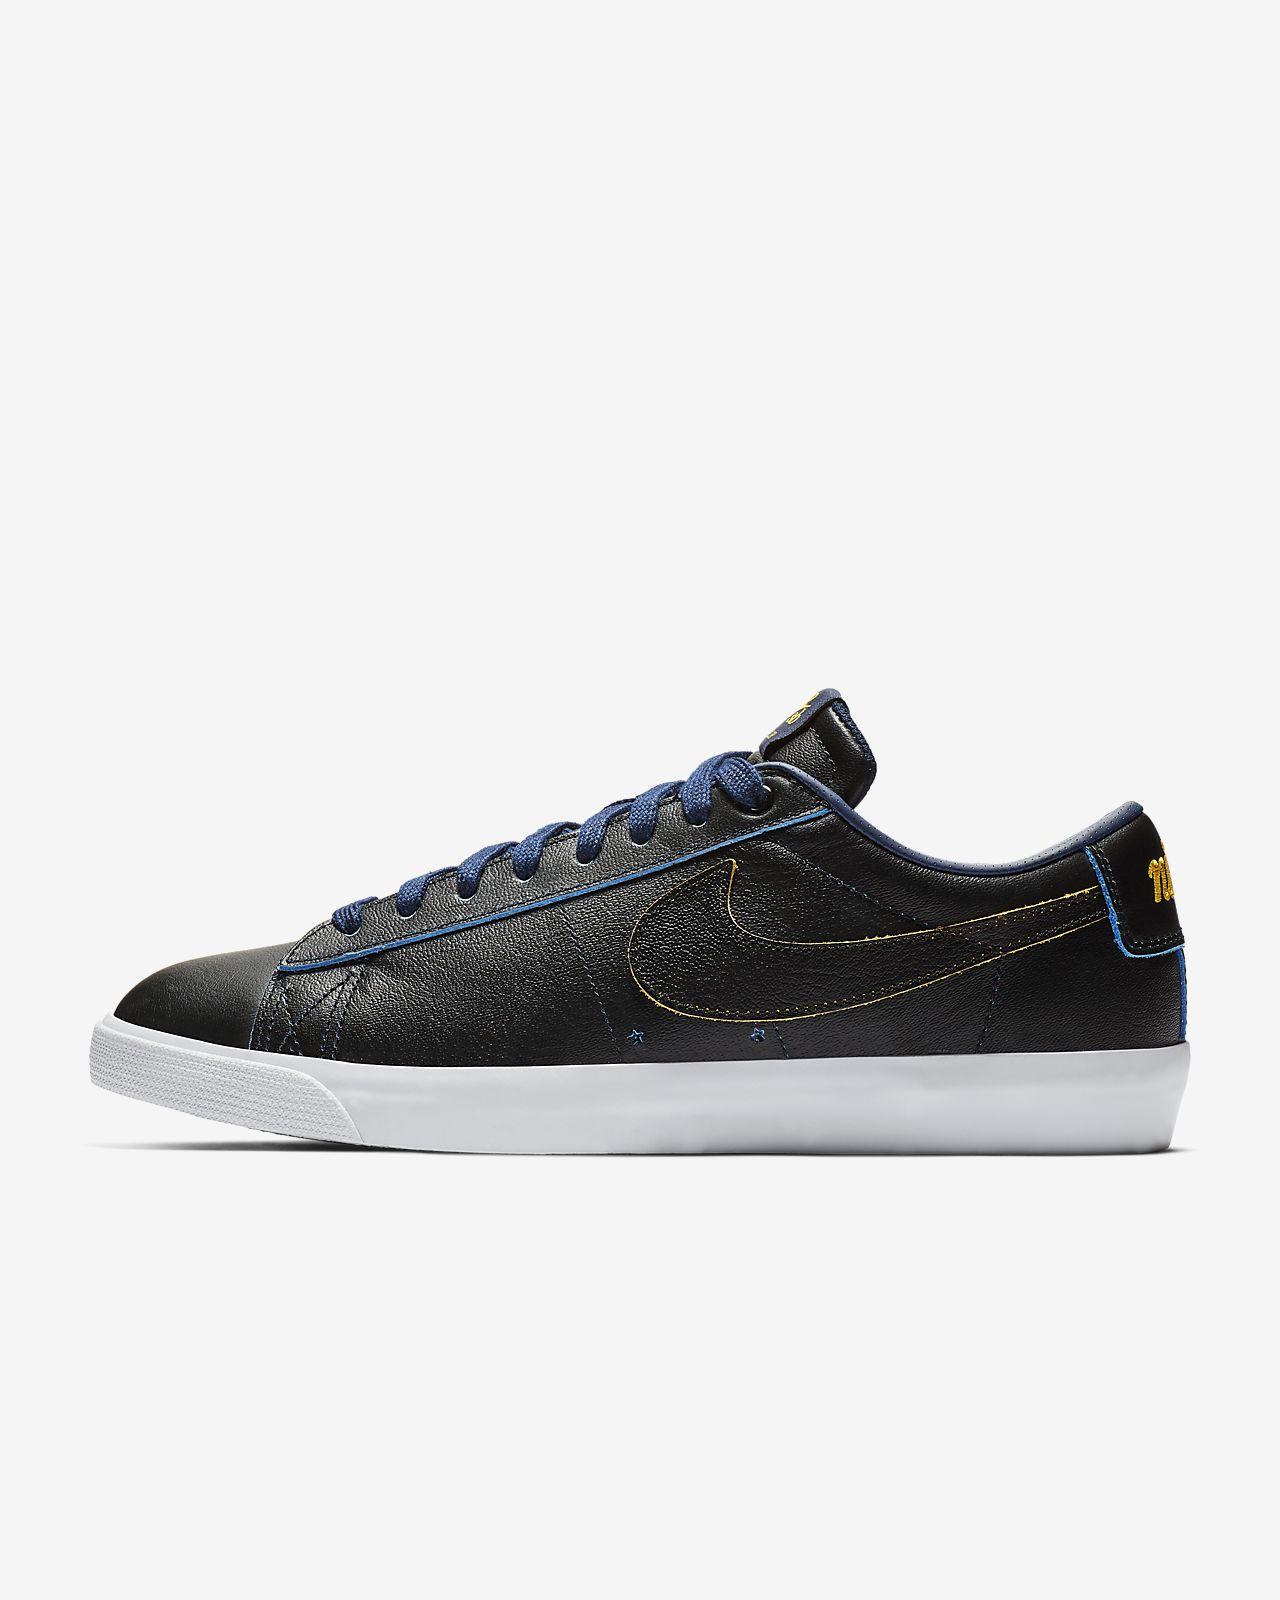 Skateboardsko Nike SB Blazer Low GT NBA för män